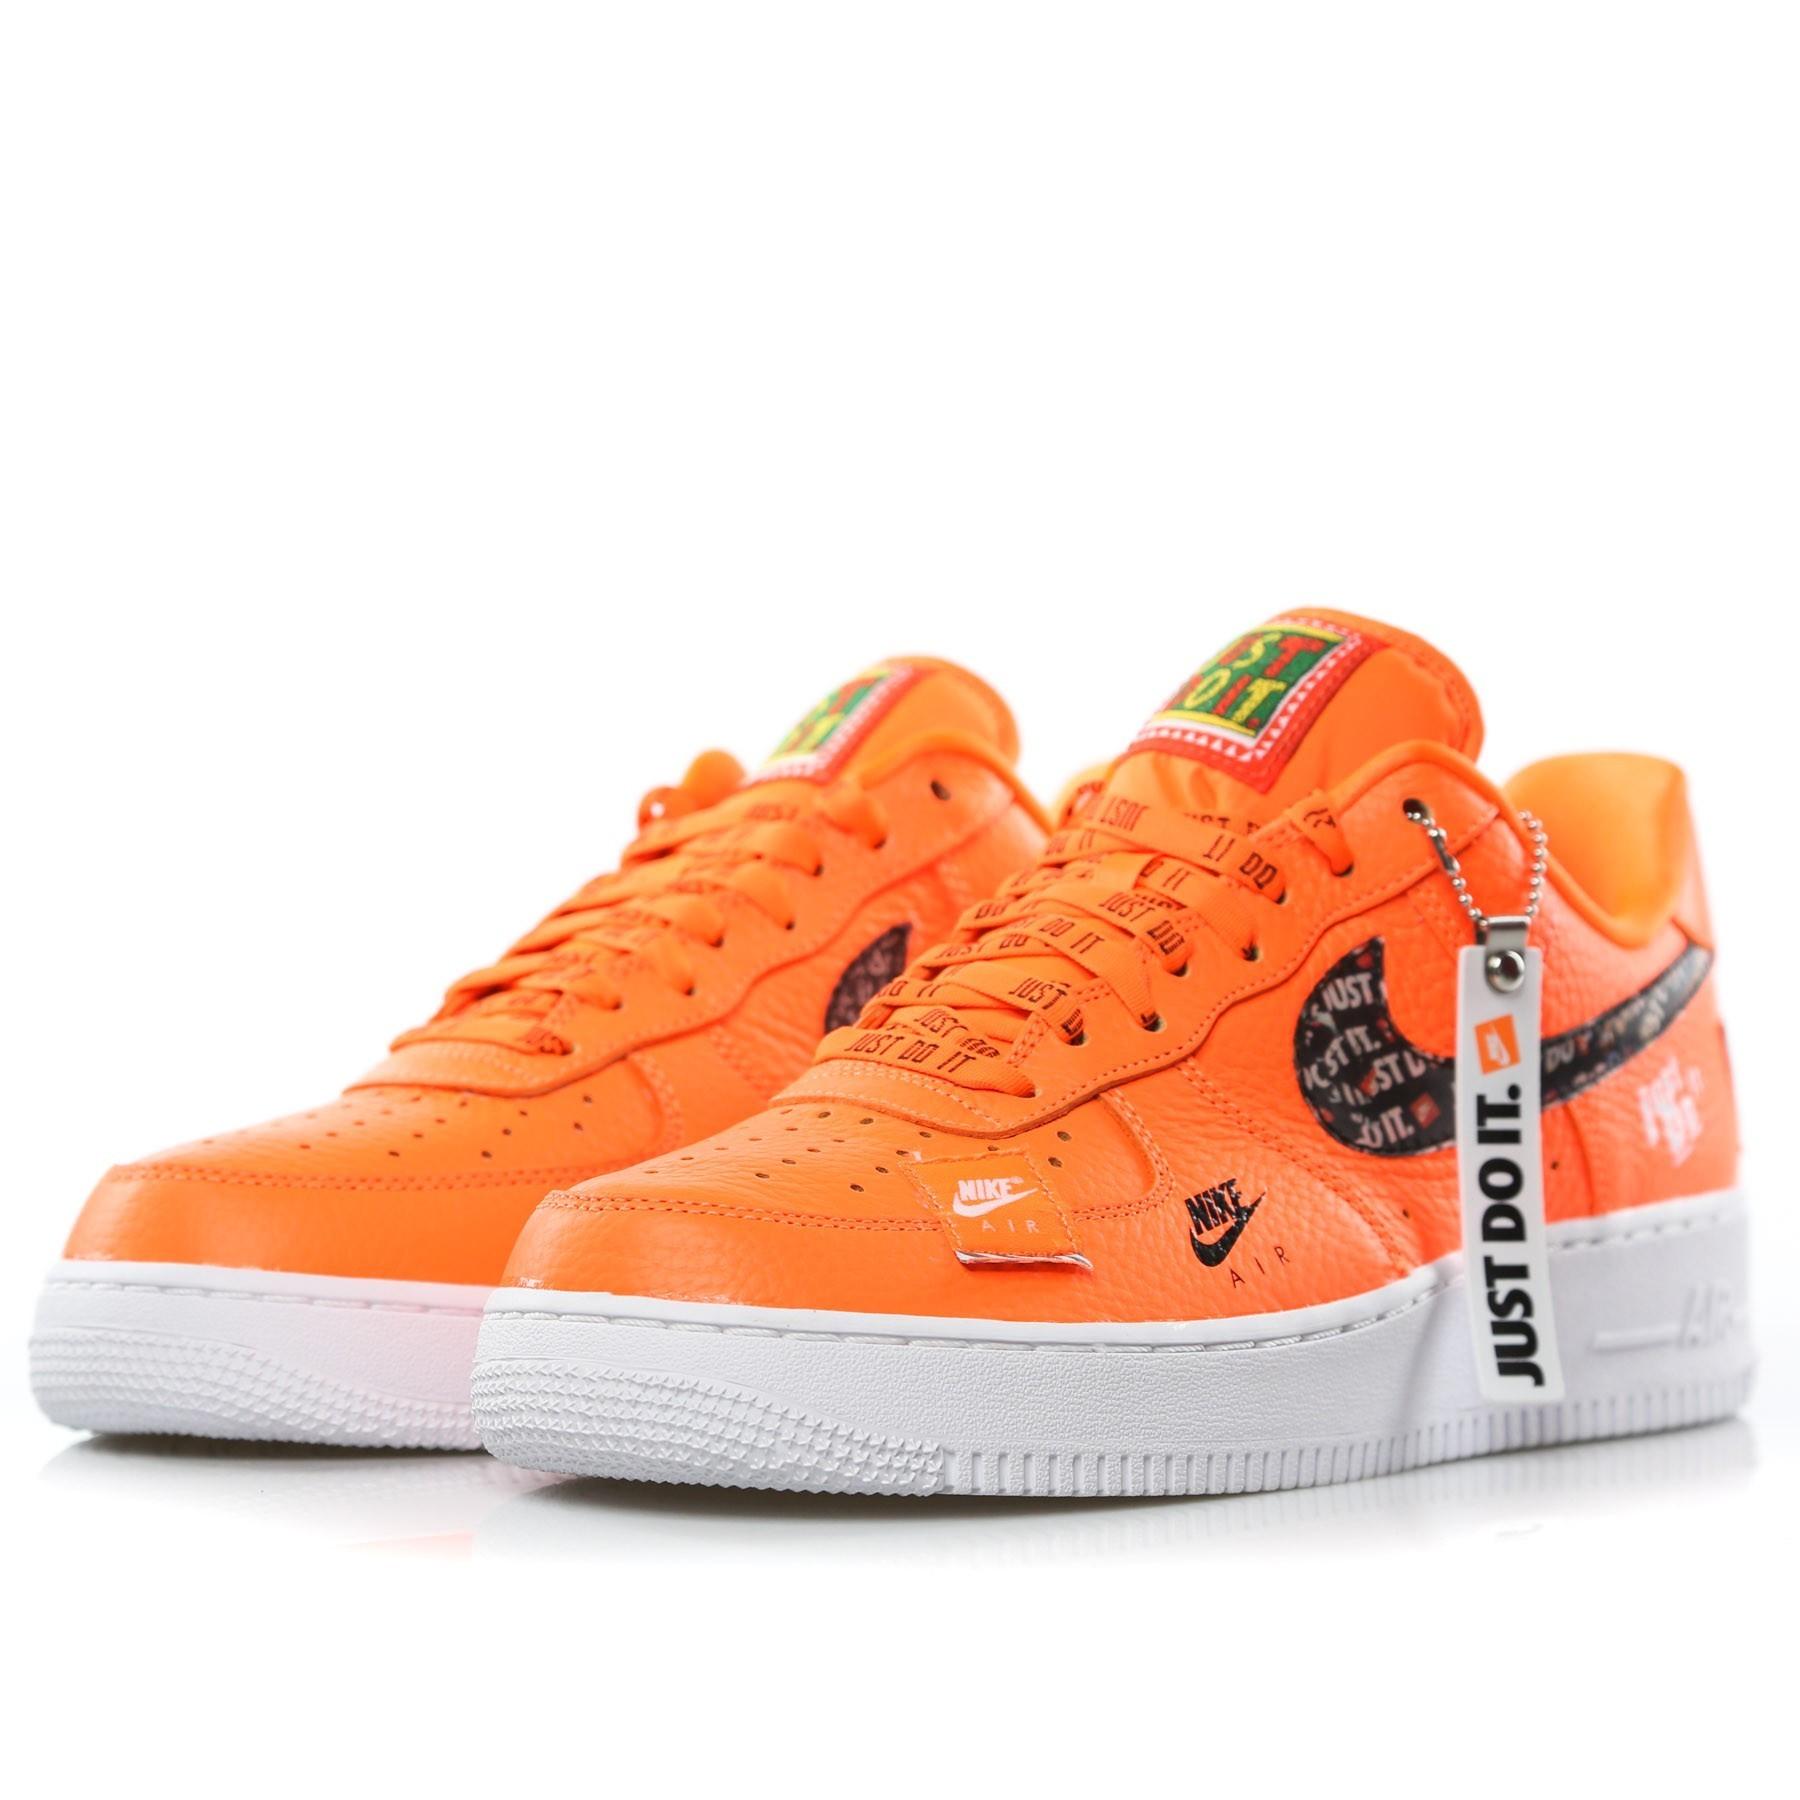 Prm 07 Total 1 Air Force Bassa Orange Scarpa Orangetotal Jdi v8wmN0n